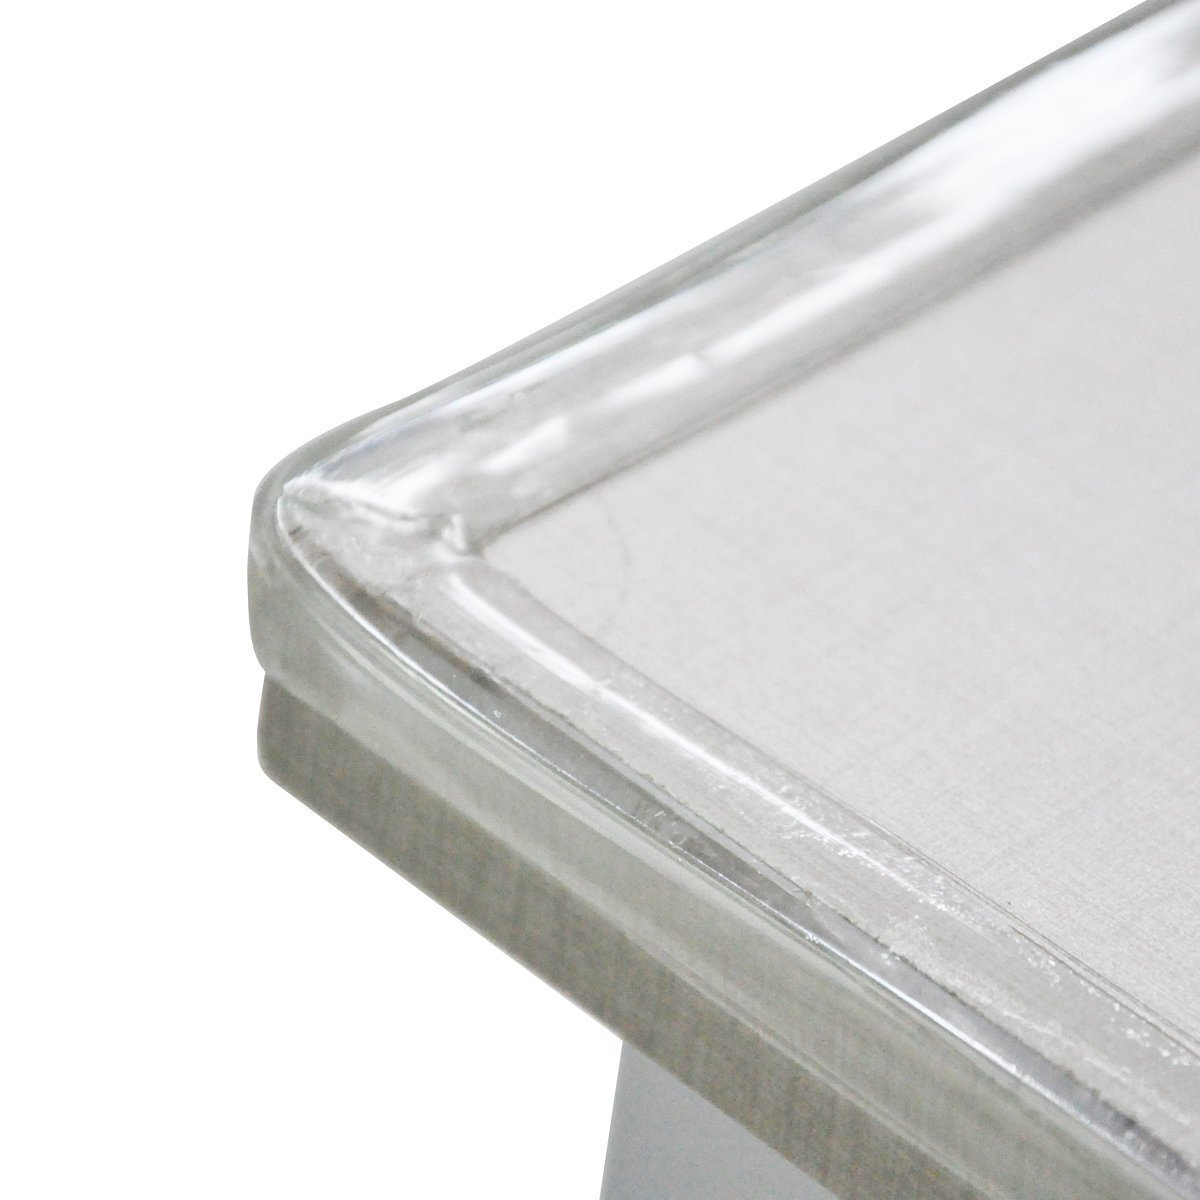 Amazon.com : Transparent Baby Bumper Strip Baby Safety Corner Protector  Table Edge Corner Cushion Strip (2m) : Baby